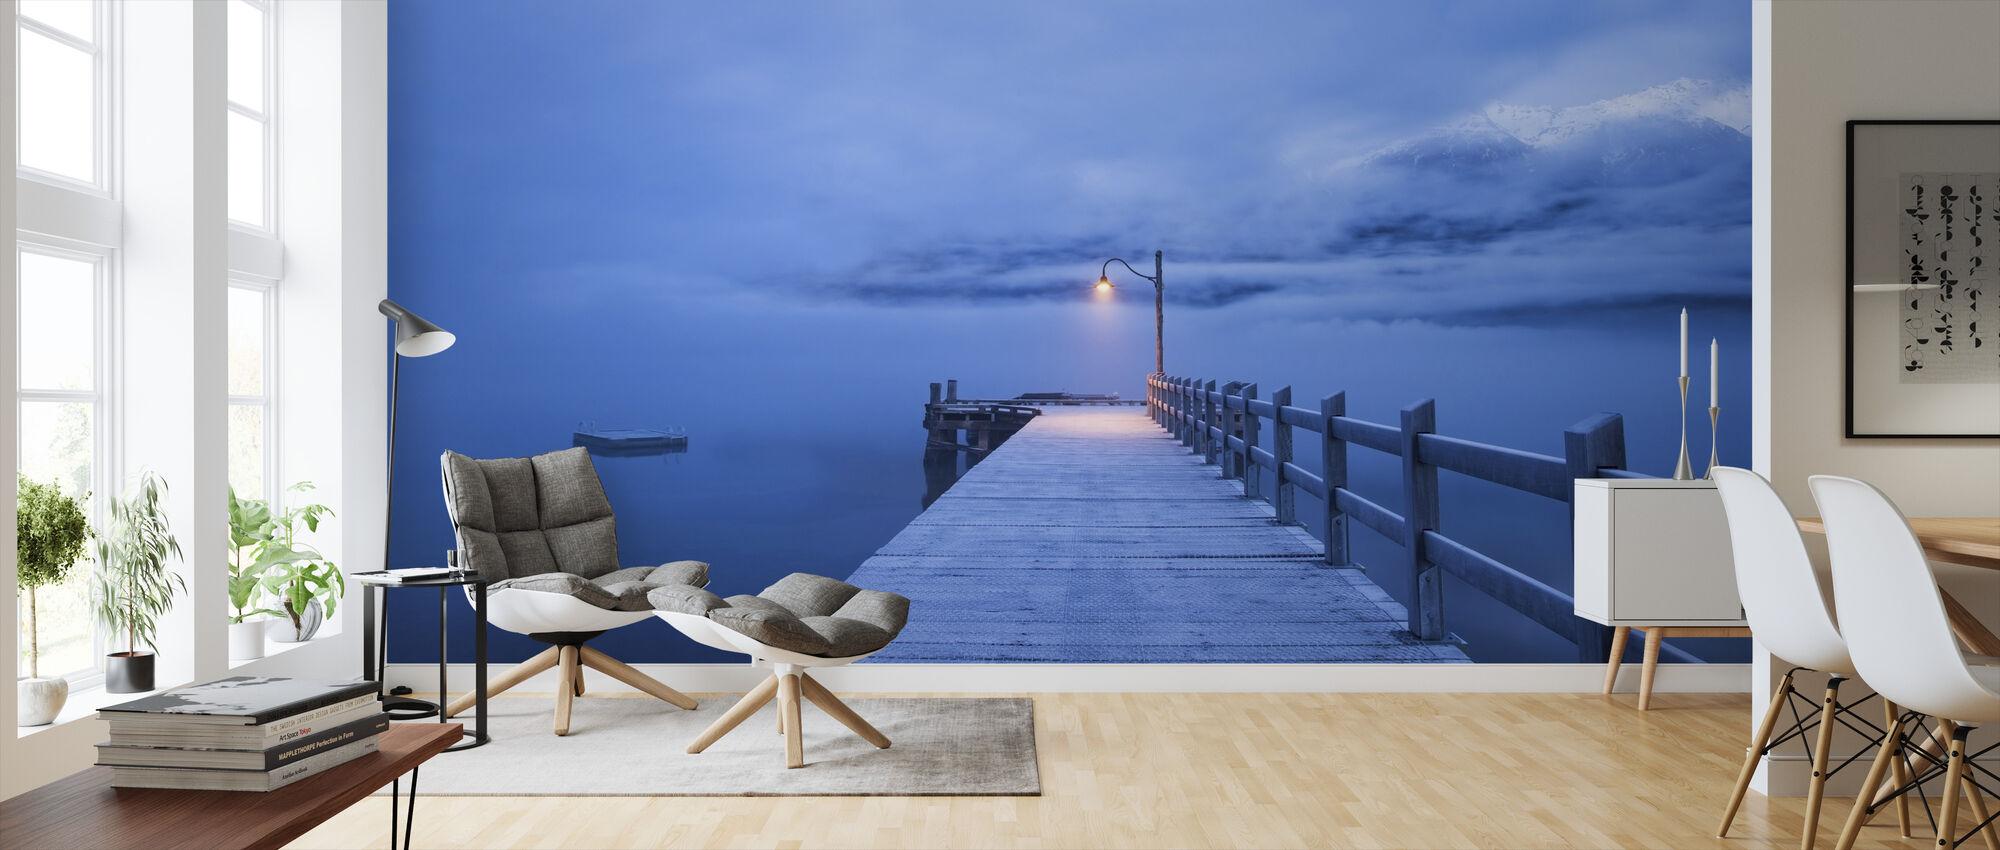 Seascape - Wallpaper - Living Room